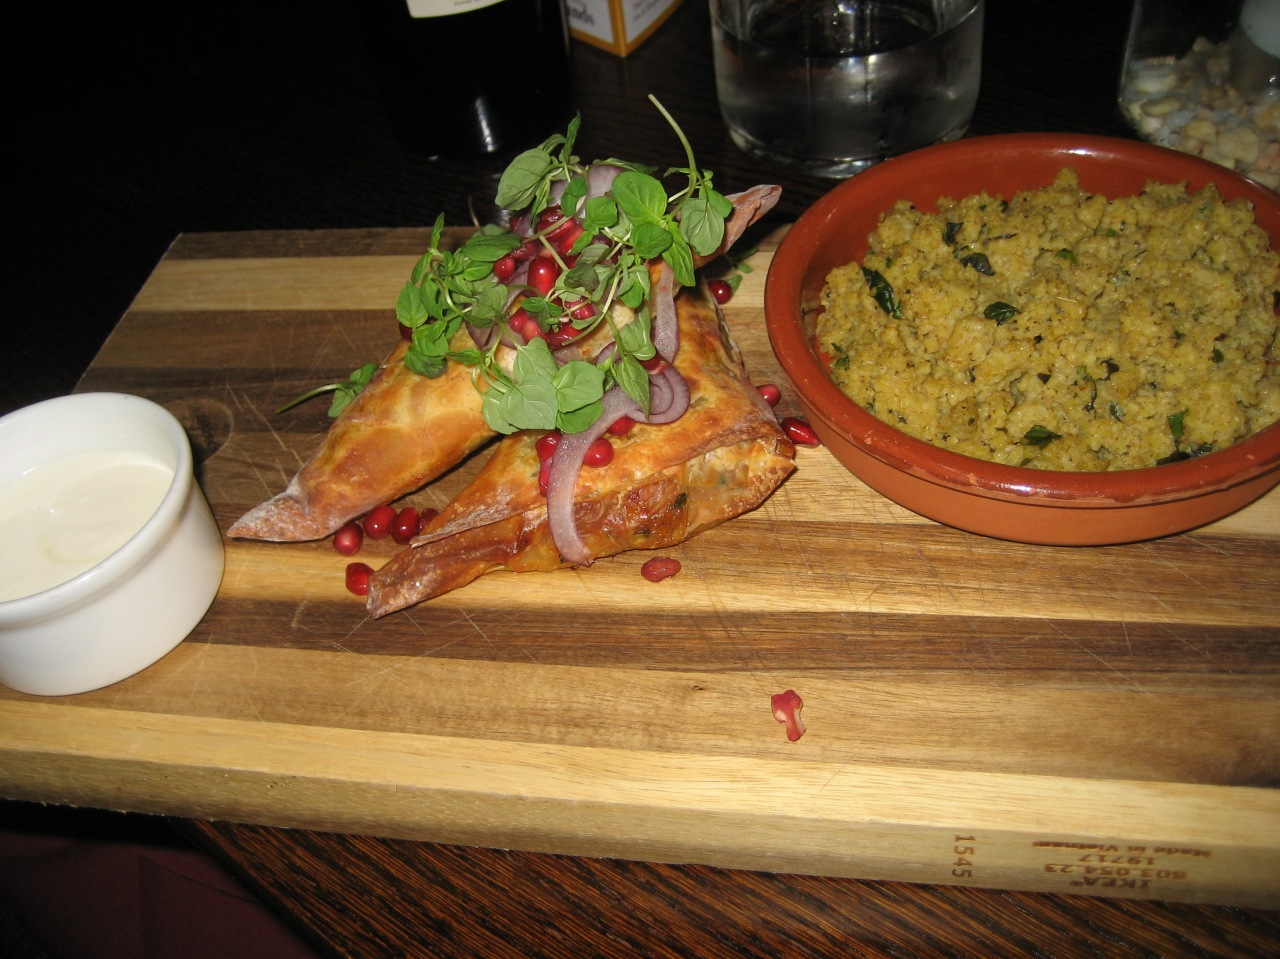 the-fox-and-hounds-harissa-spiced-lamb-feta-and-spinach-parcel-spiced-bulgur-wheat-pomegranate-salad-honey-yogurt-004_36620782310_o